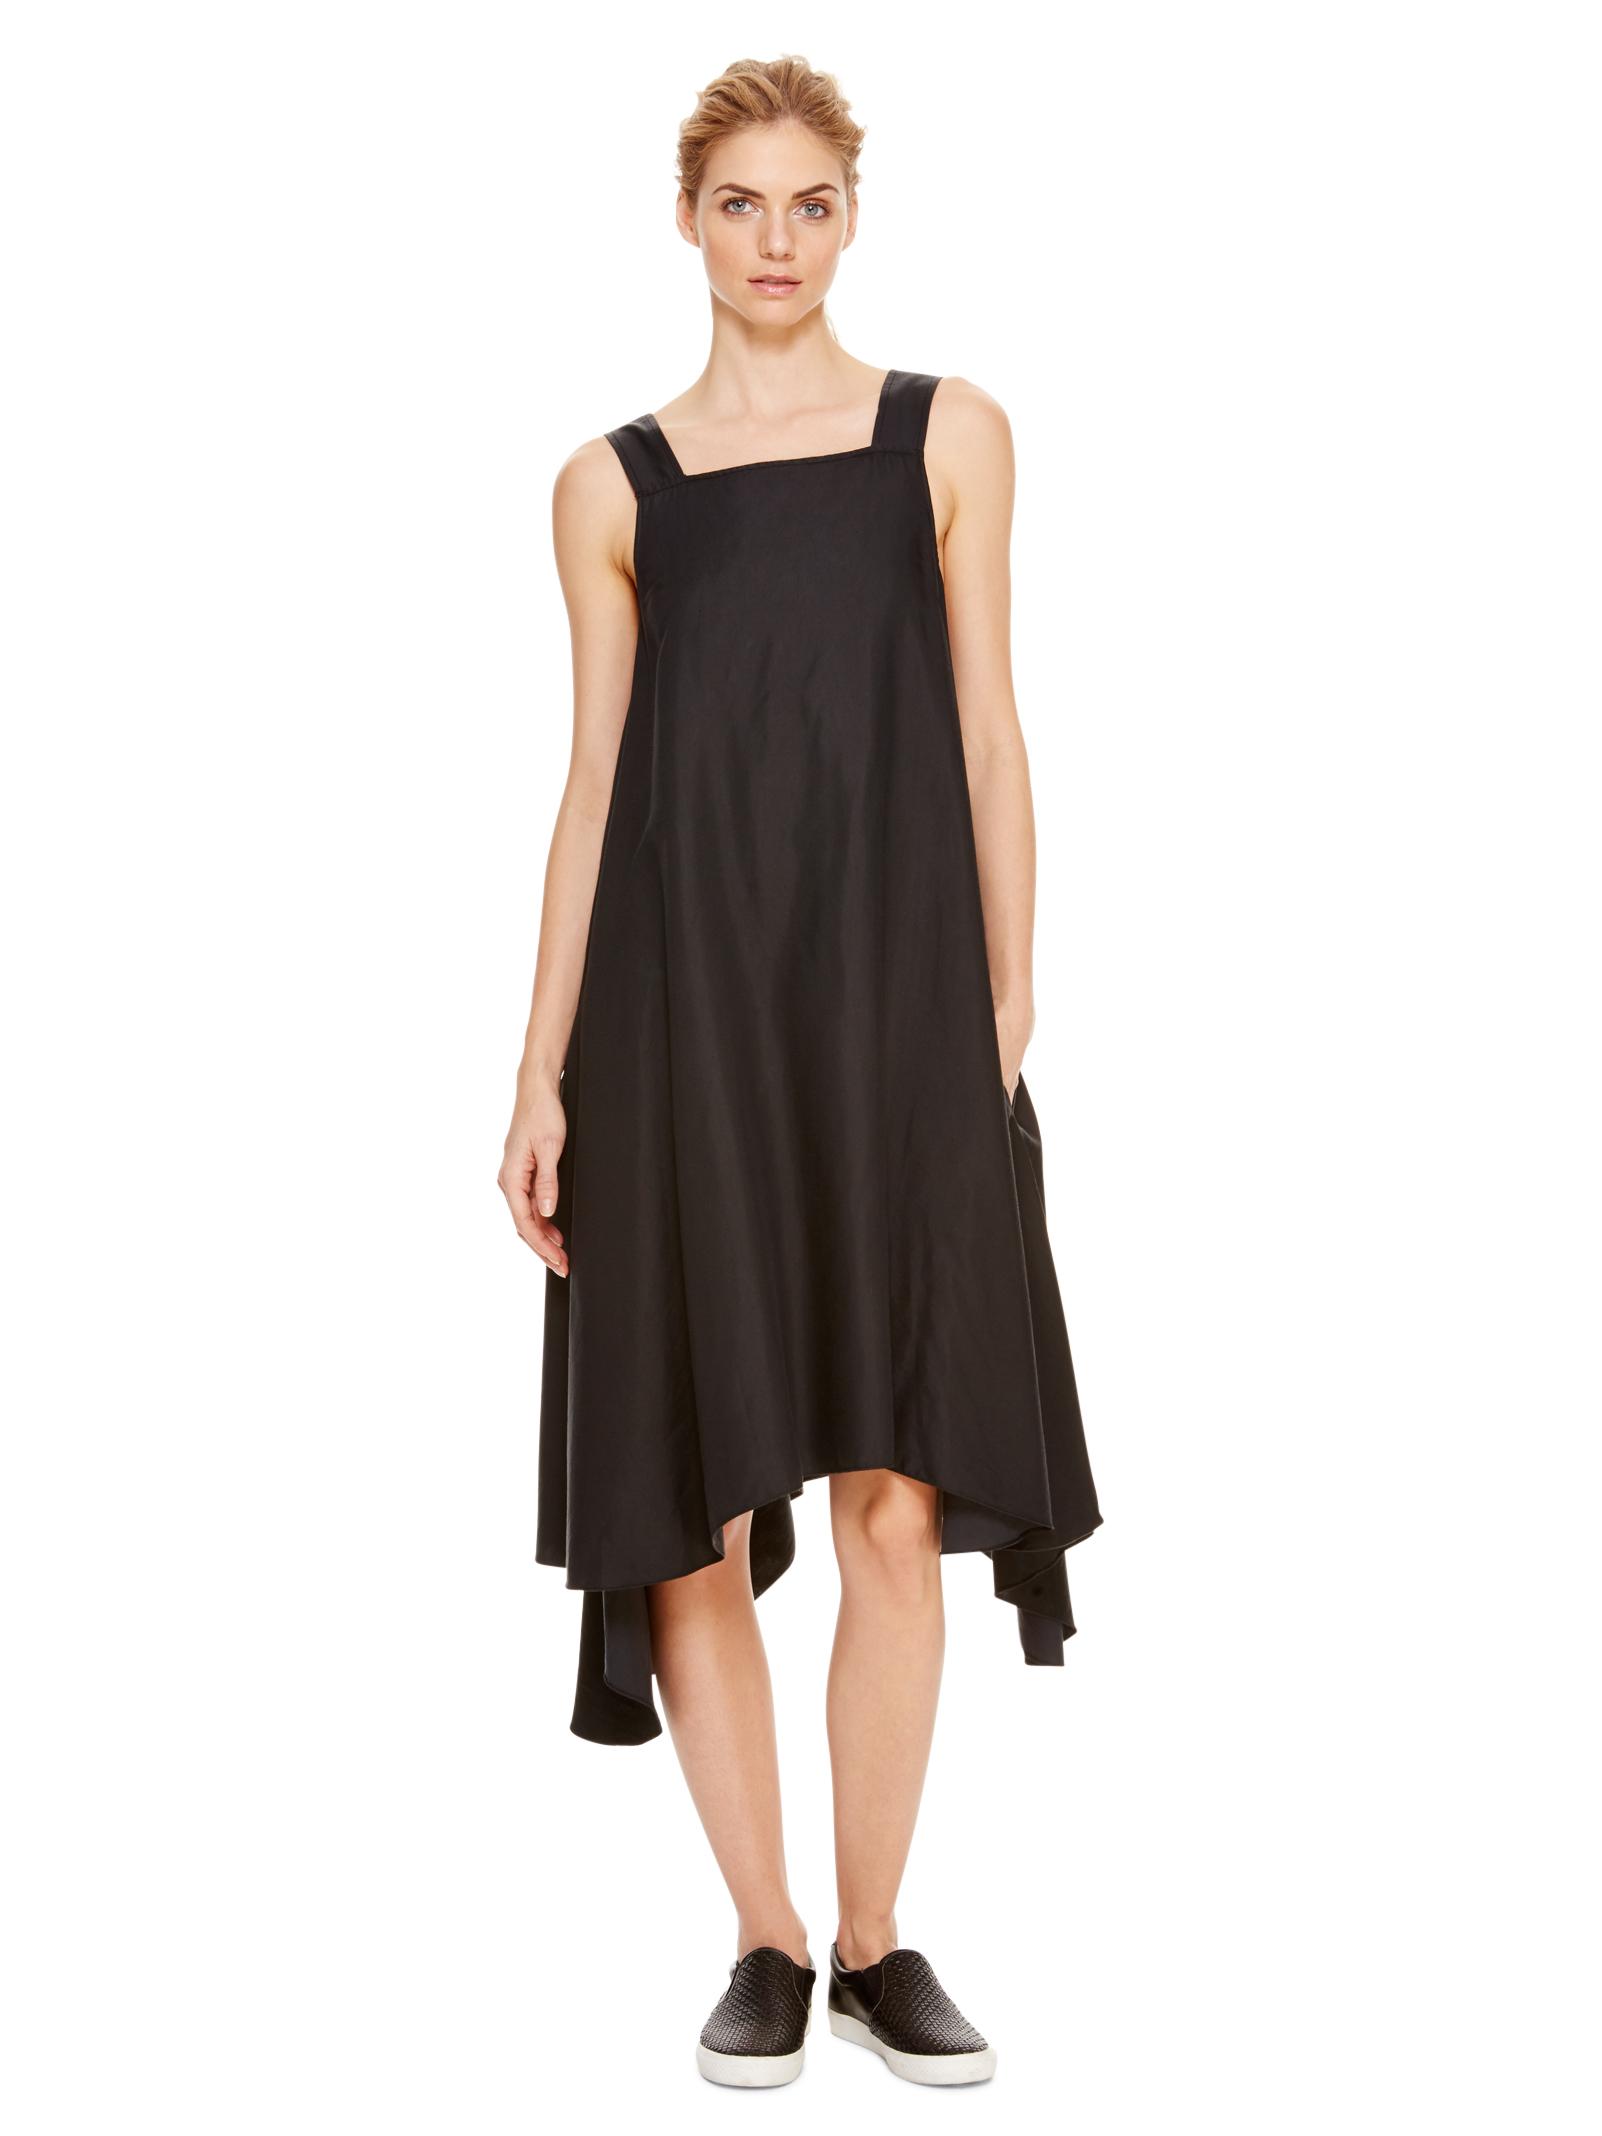 Black DKNYpure Sleeveless Trapeze Dress